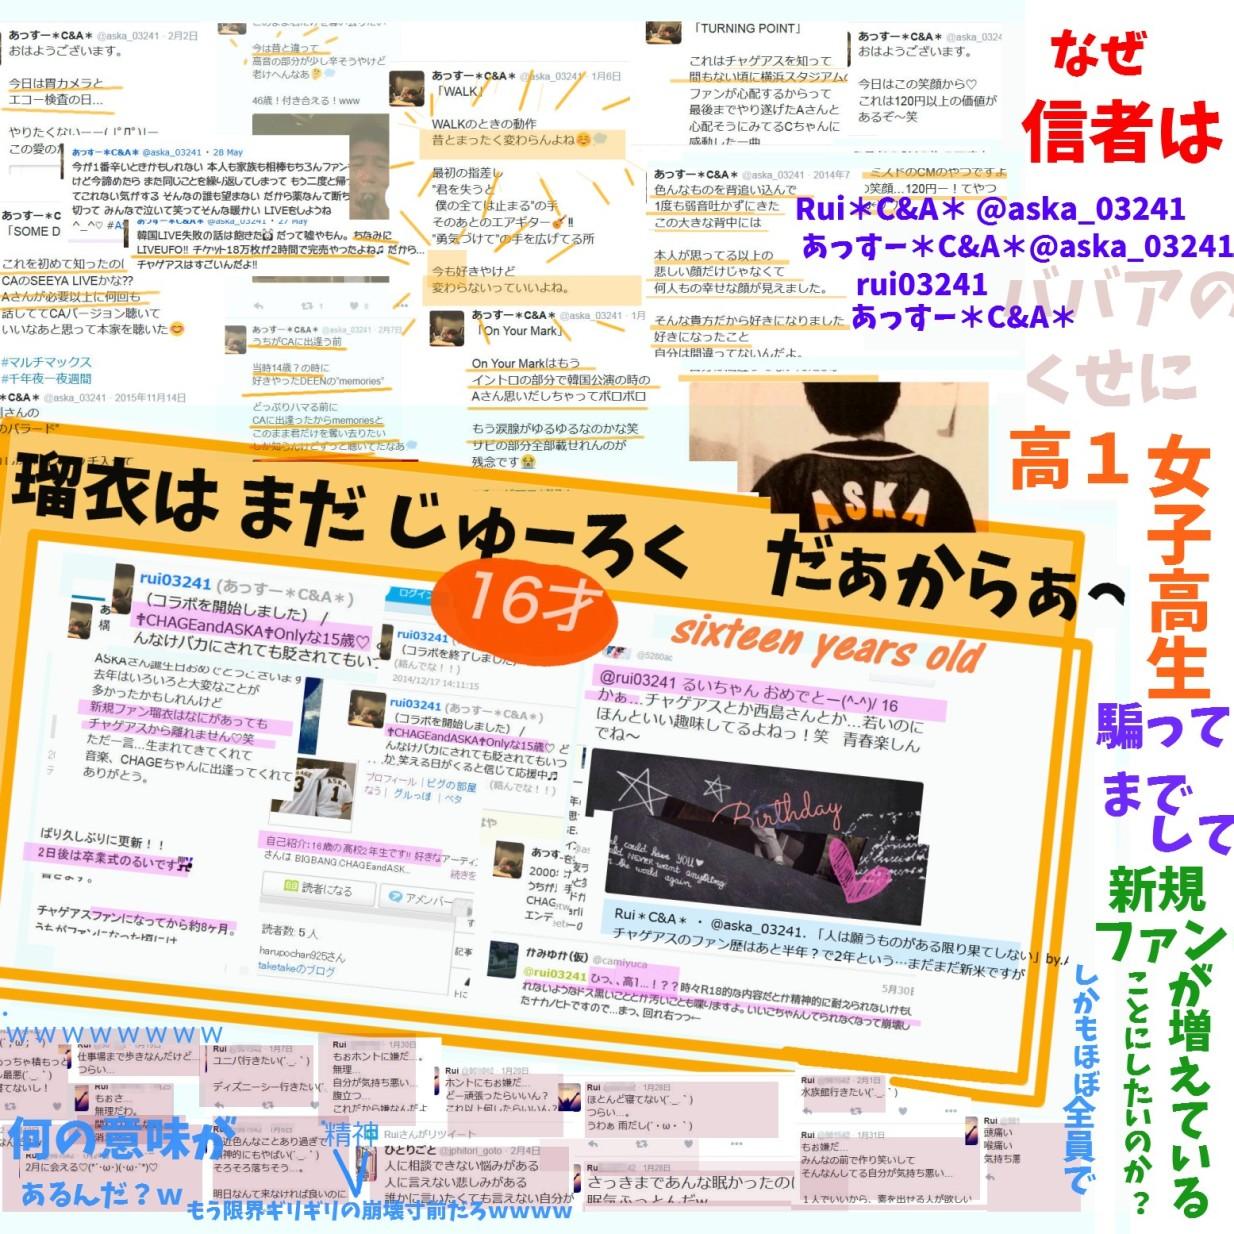 CHAGE and ASKA まつきち&japisL専用次スレ [無断転載禁止]©2ch.netYouTube動画>3本 ->画像>55枚